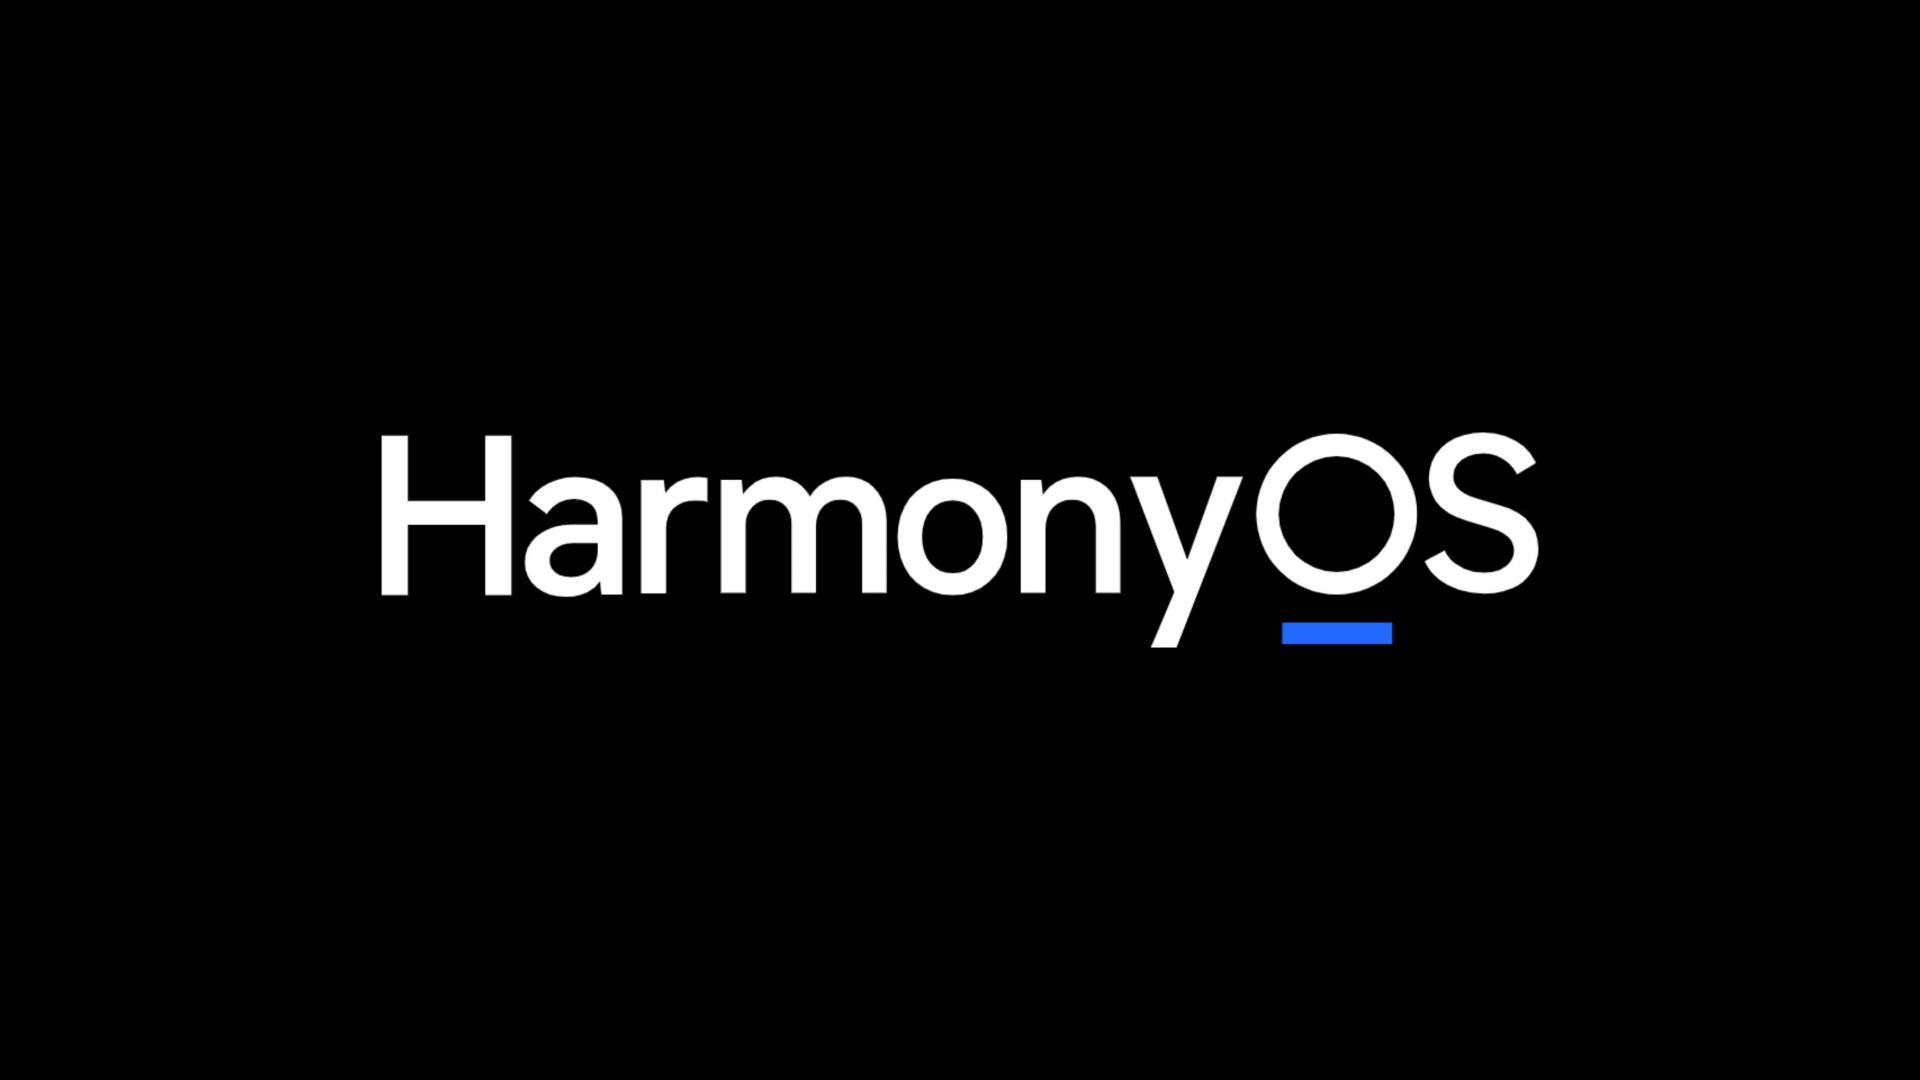 HONOR Magic UI5.0 базируется наHUAWEI Harmony OS